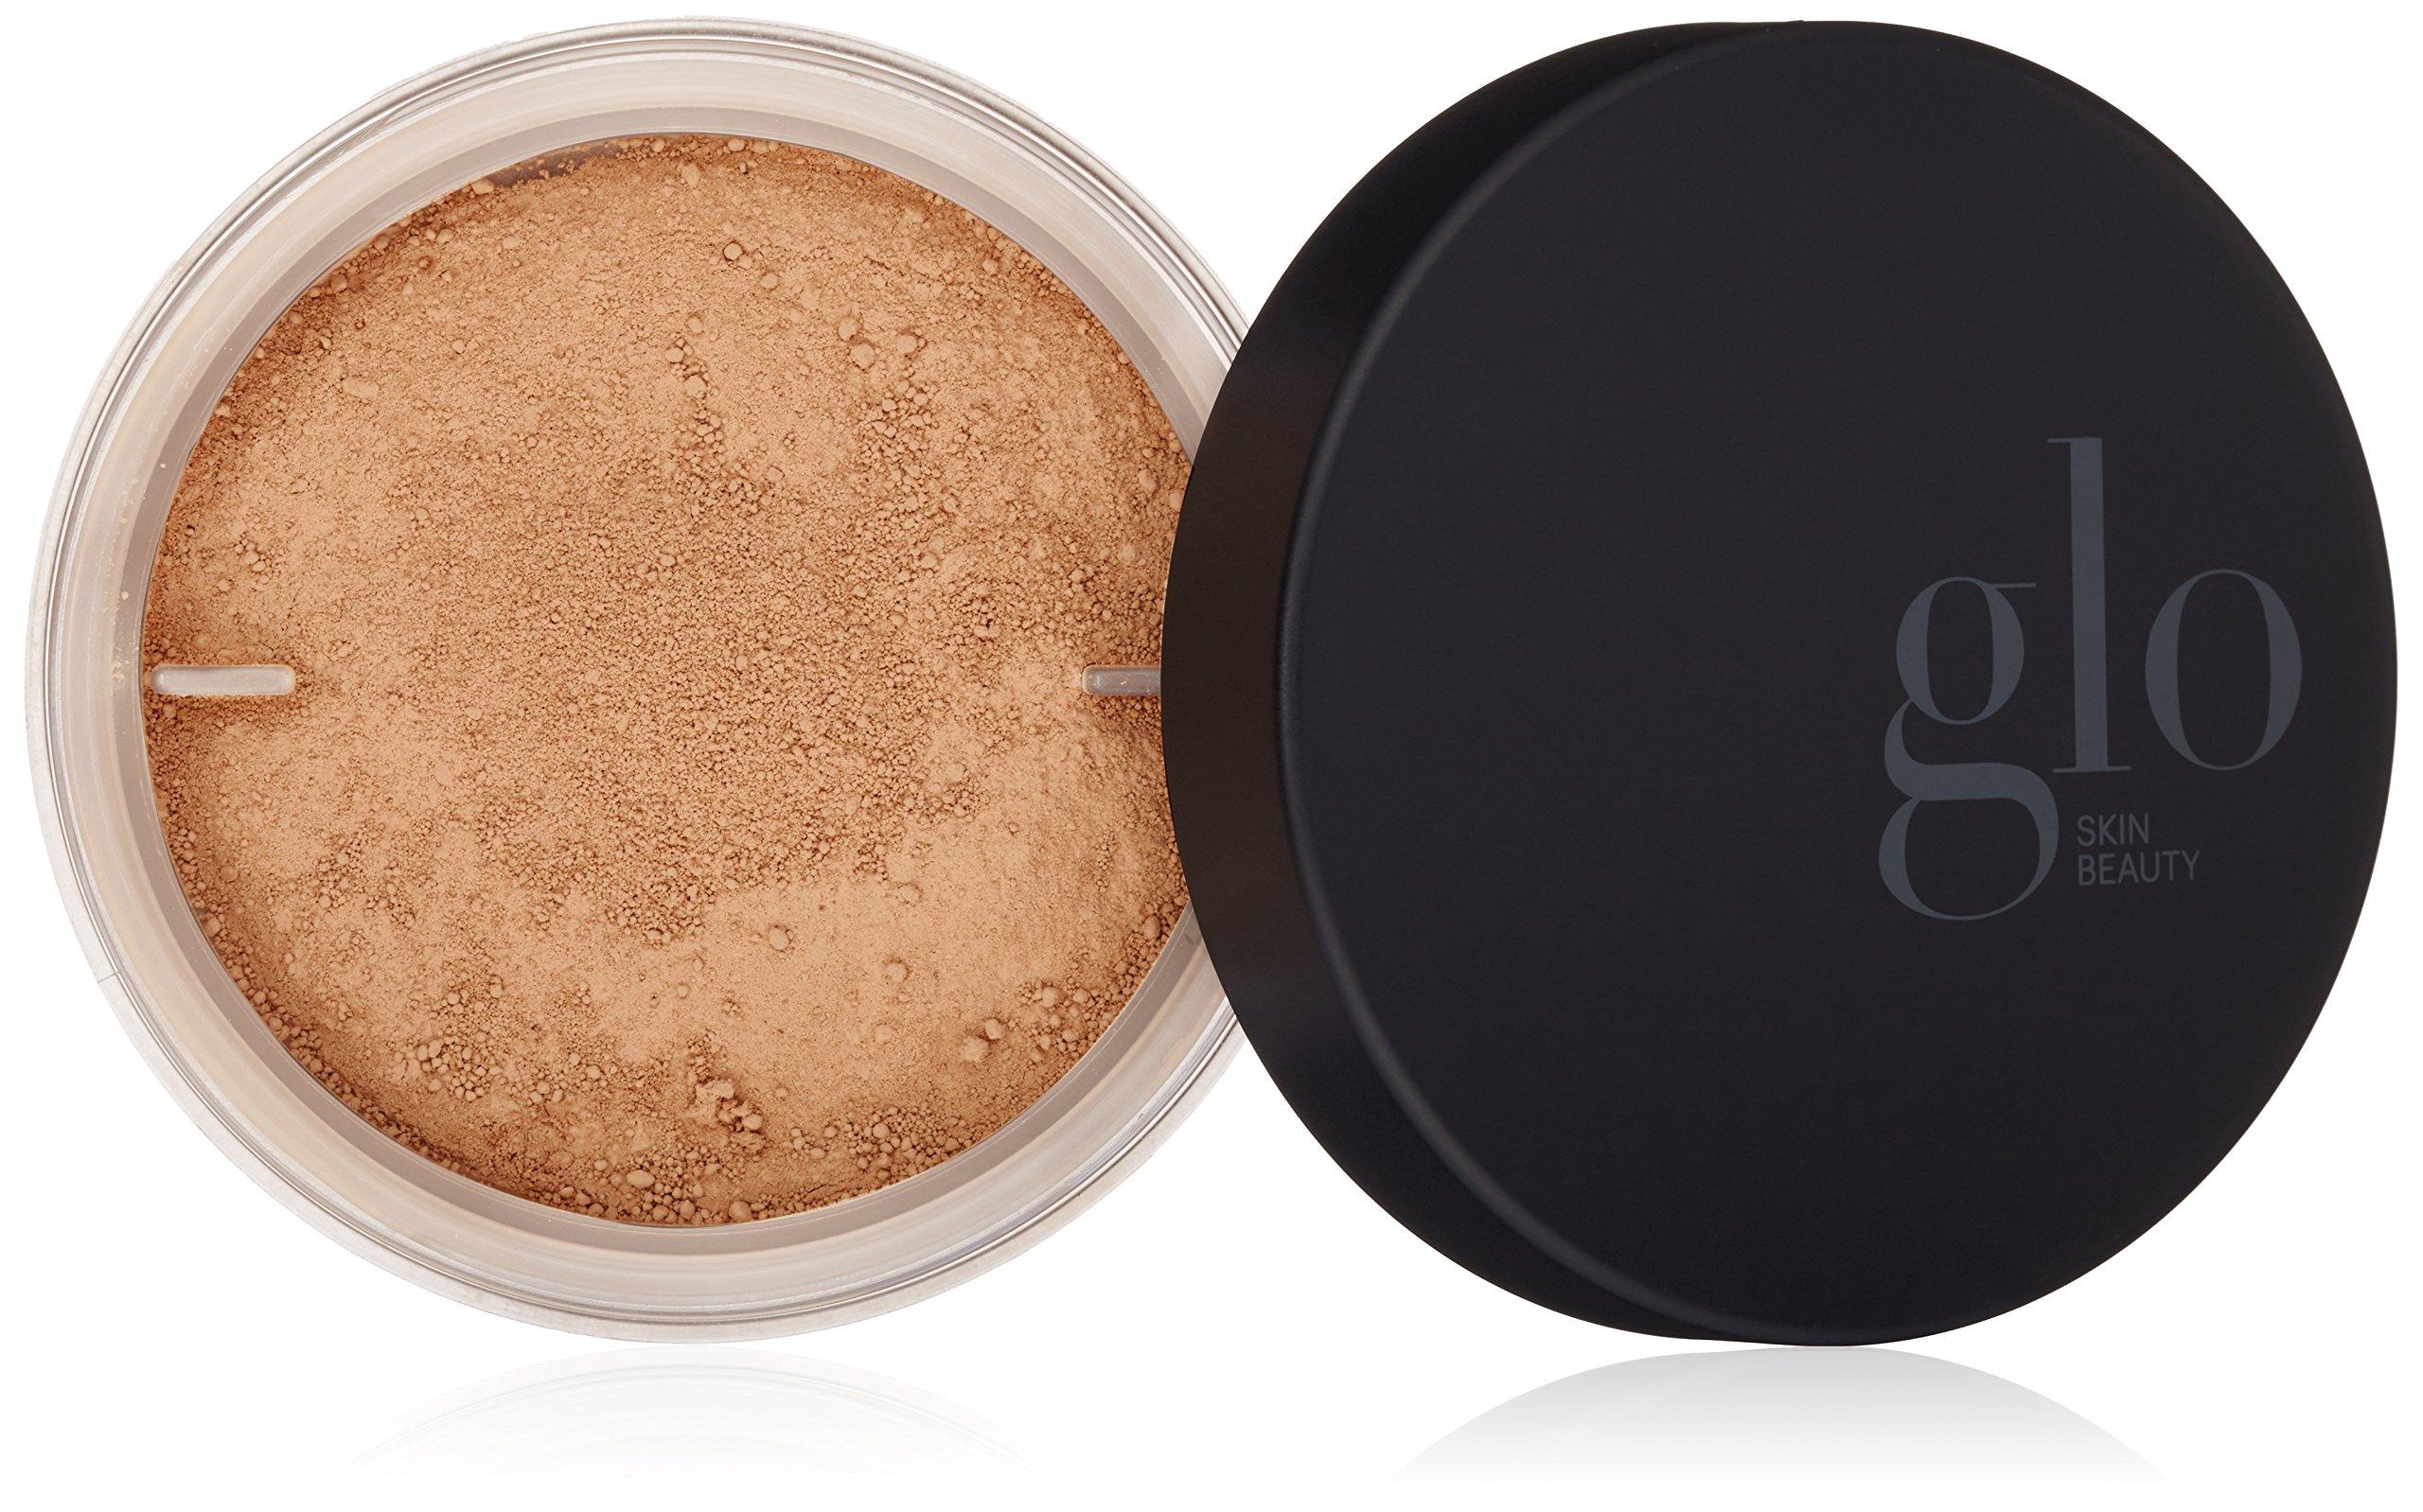 Glo Skin Beauty Loose Base Makeup Powder Foundation, Beige